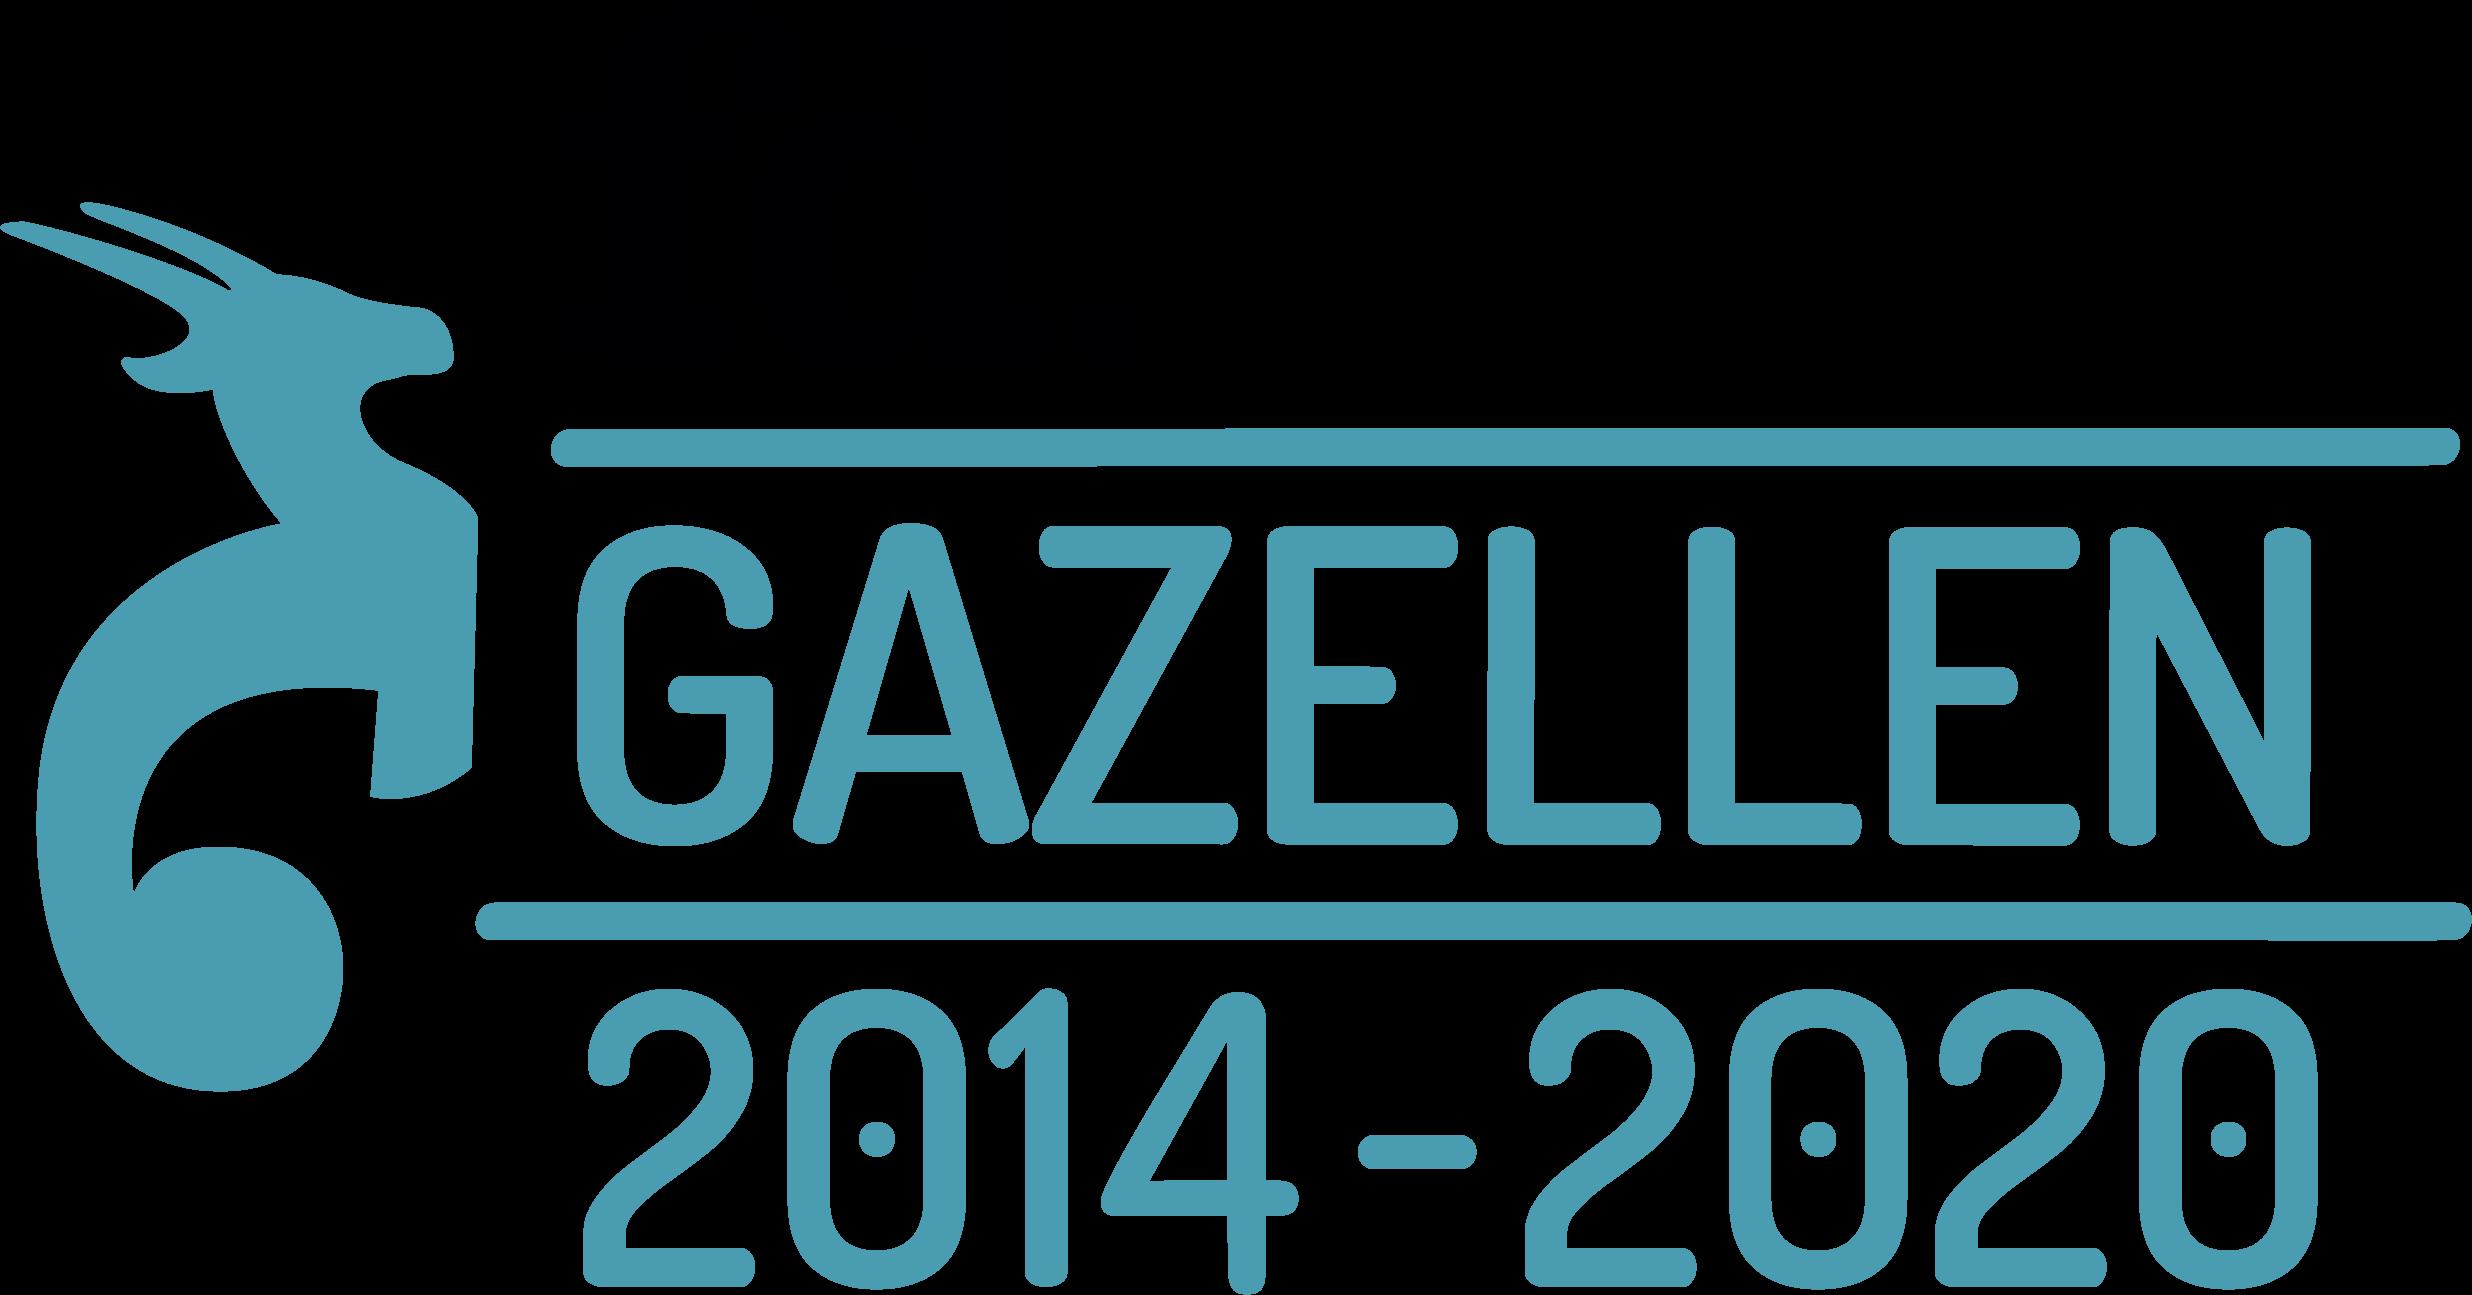 fd 2014-2020